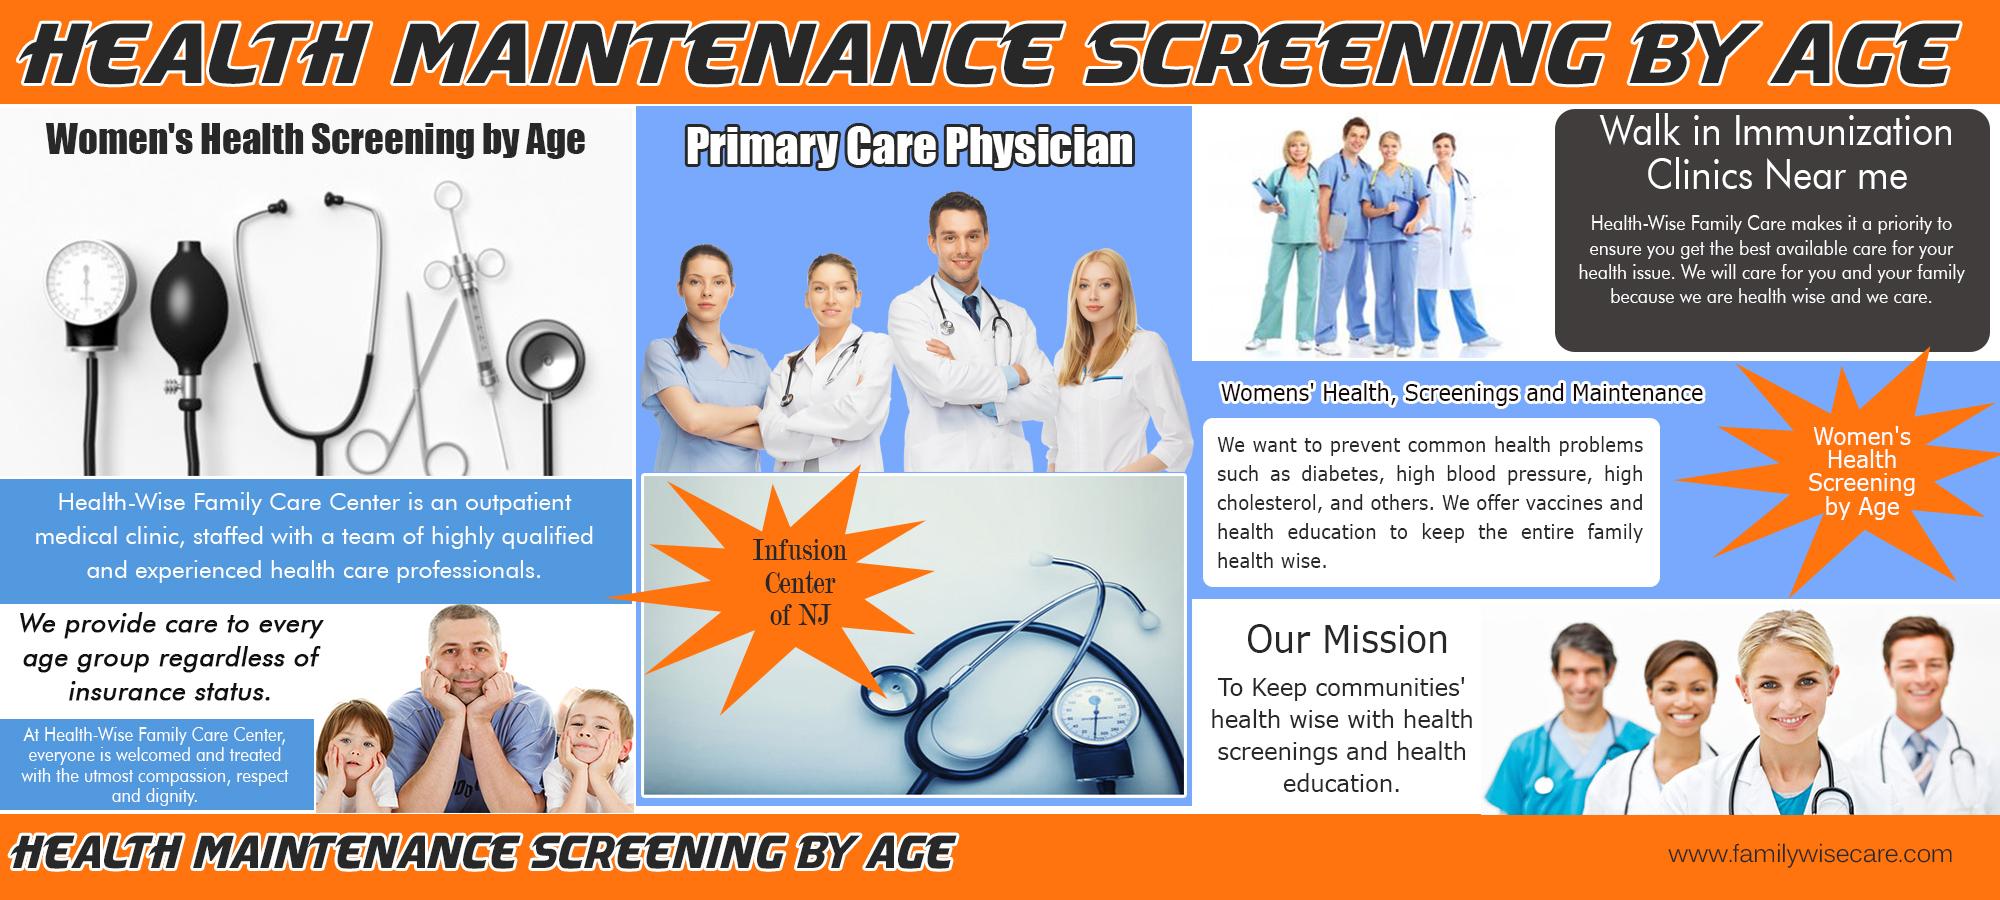 Health Maintenance Screening by Age.jpg